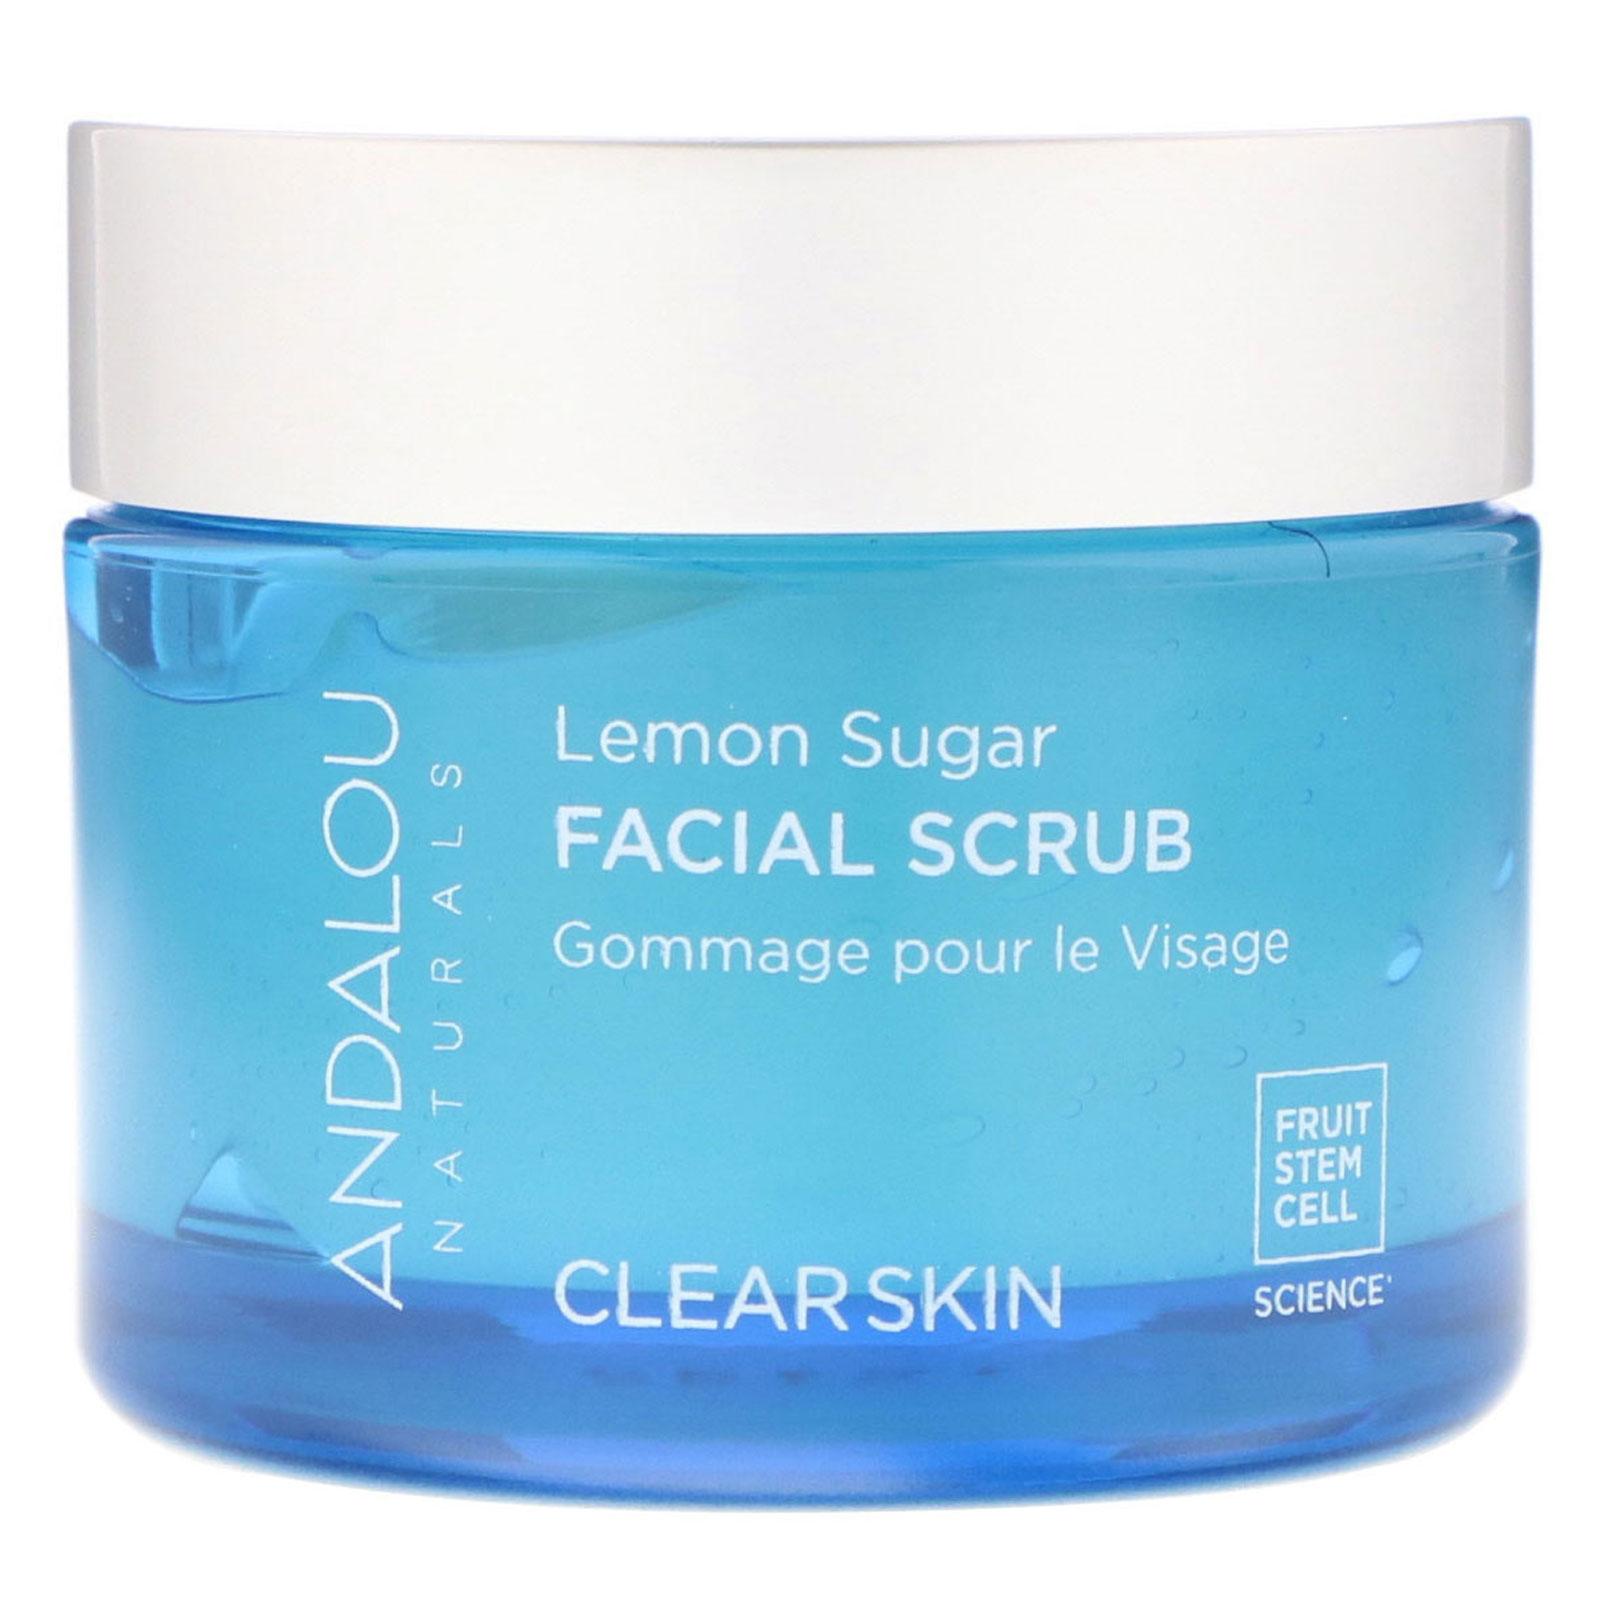 Andalou Naturals, Facial Scrub, Lemon Sugar, Clarifying, 1.7 oz (50 g) (Pack of 3) Babyface Skin Fix Serum 2.5% Retinol, 20% Vitamin C, Niacinamide ~ Fights Acne and Wrinkles, 1.2 oz.